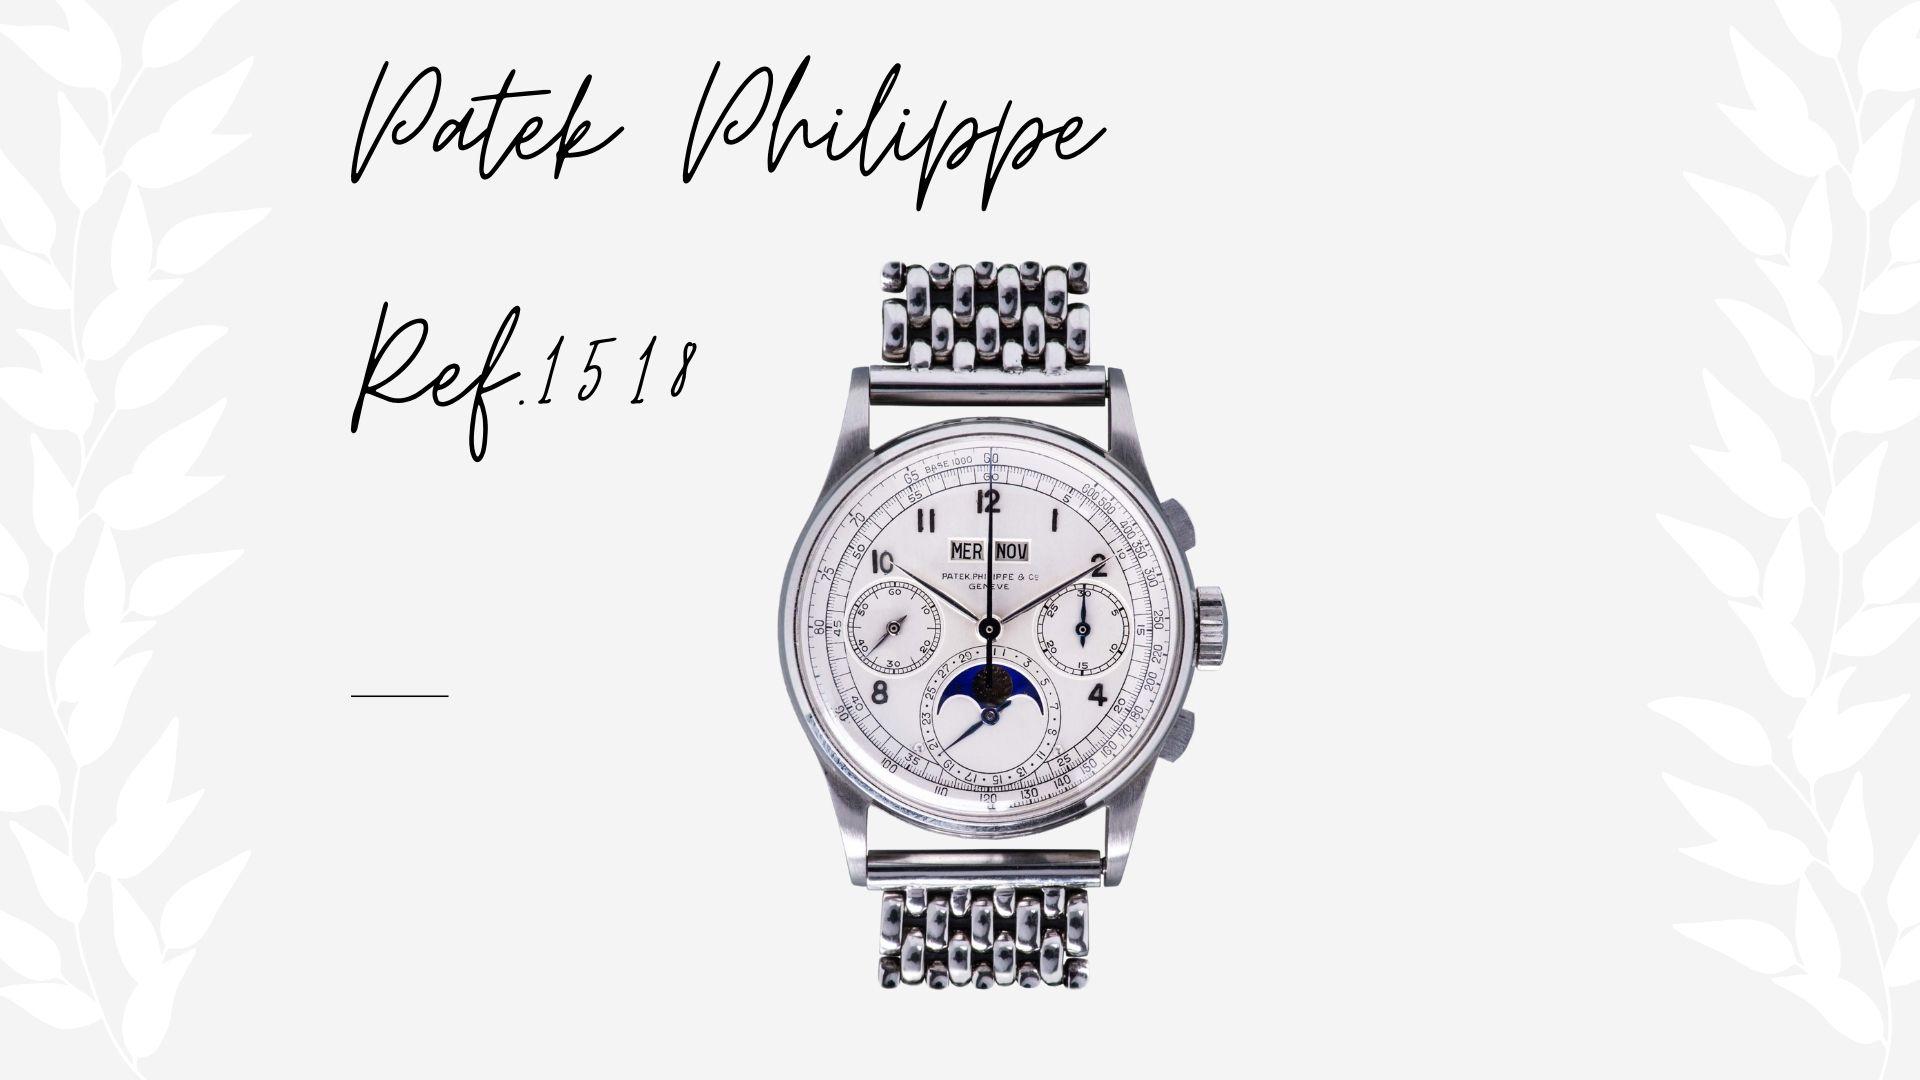 Patek Philippe Ref.1518 - นาฬิกาที่แพงที่สุดในโลก